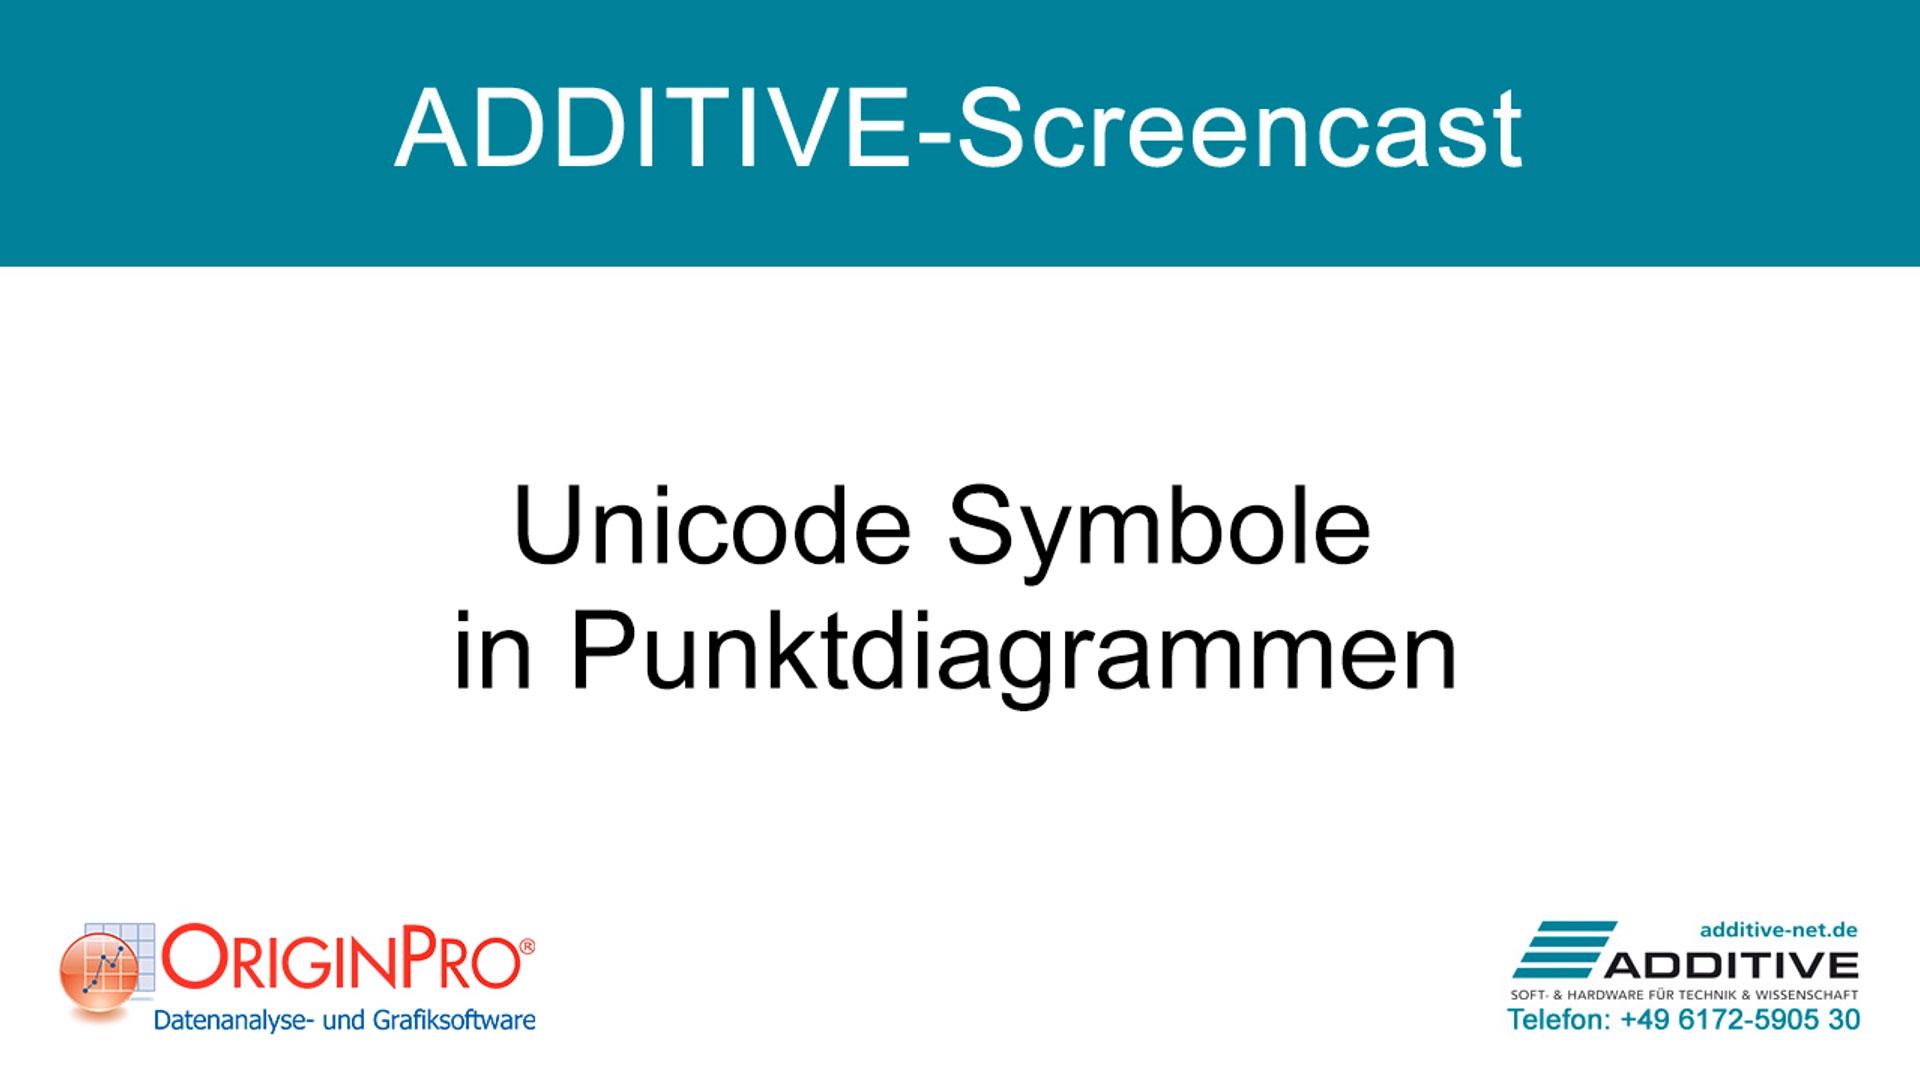 Unicode-Symbole in Punktdiagrammen in OriginPro 2021